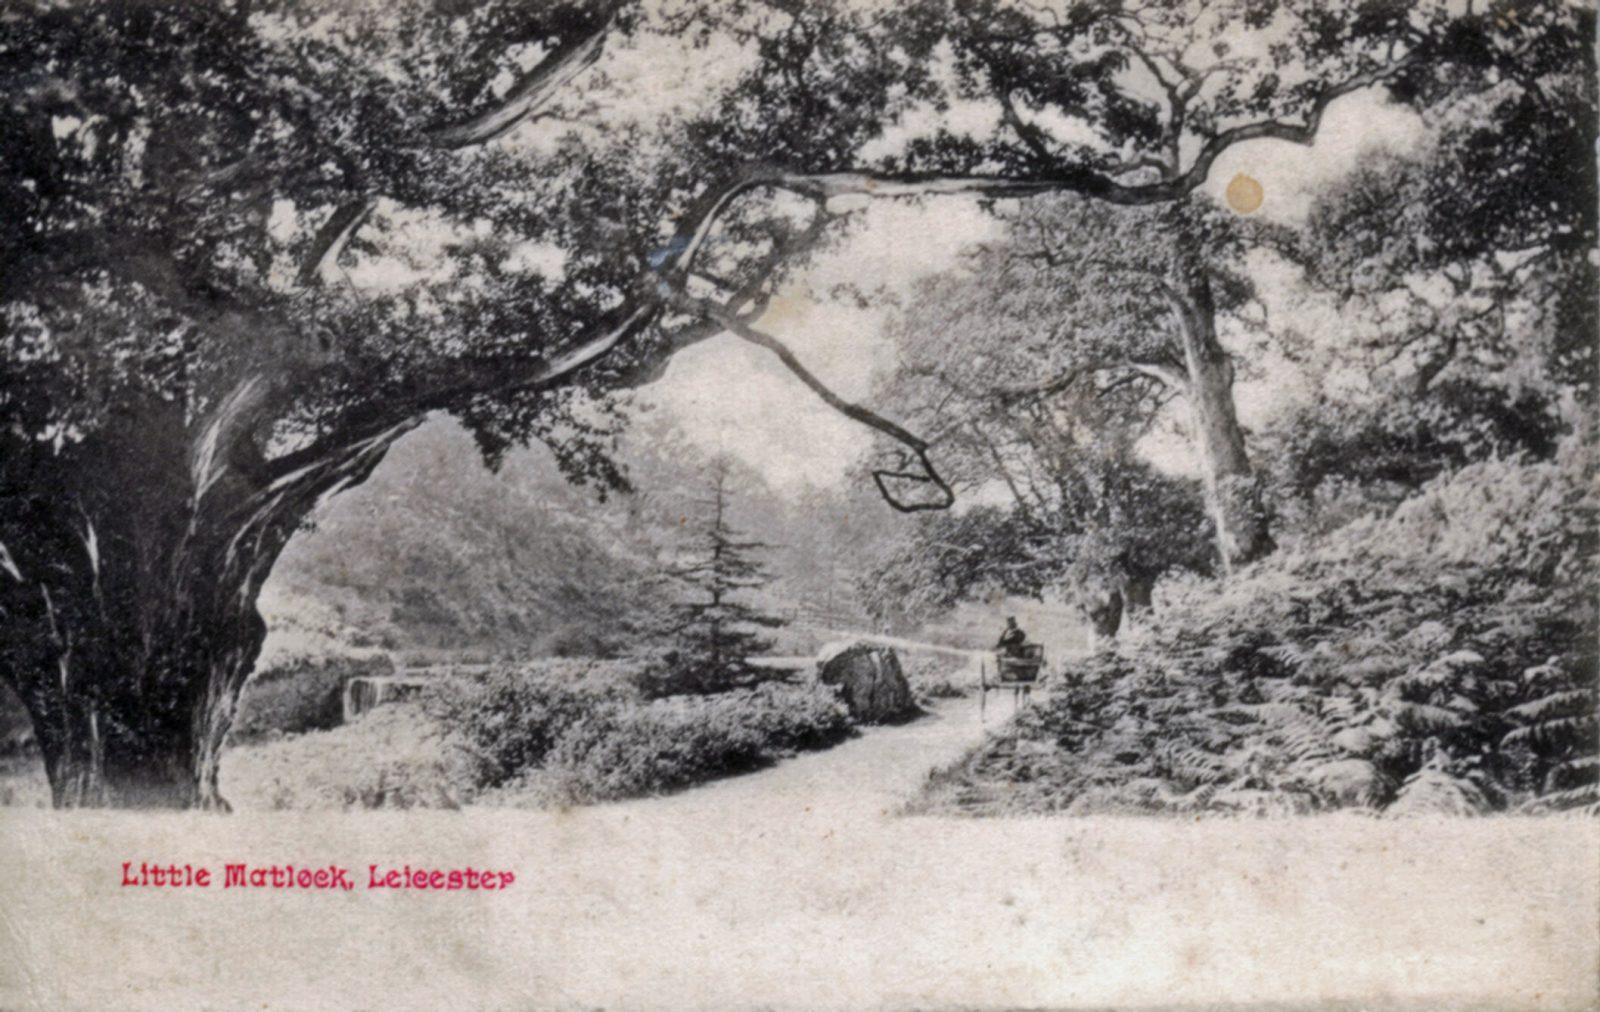 Bradgate Park, Leicester. 1901-1920: